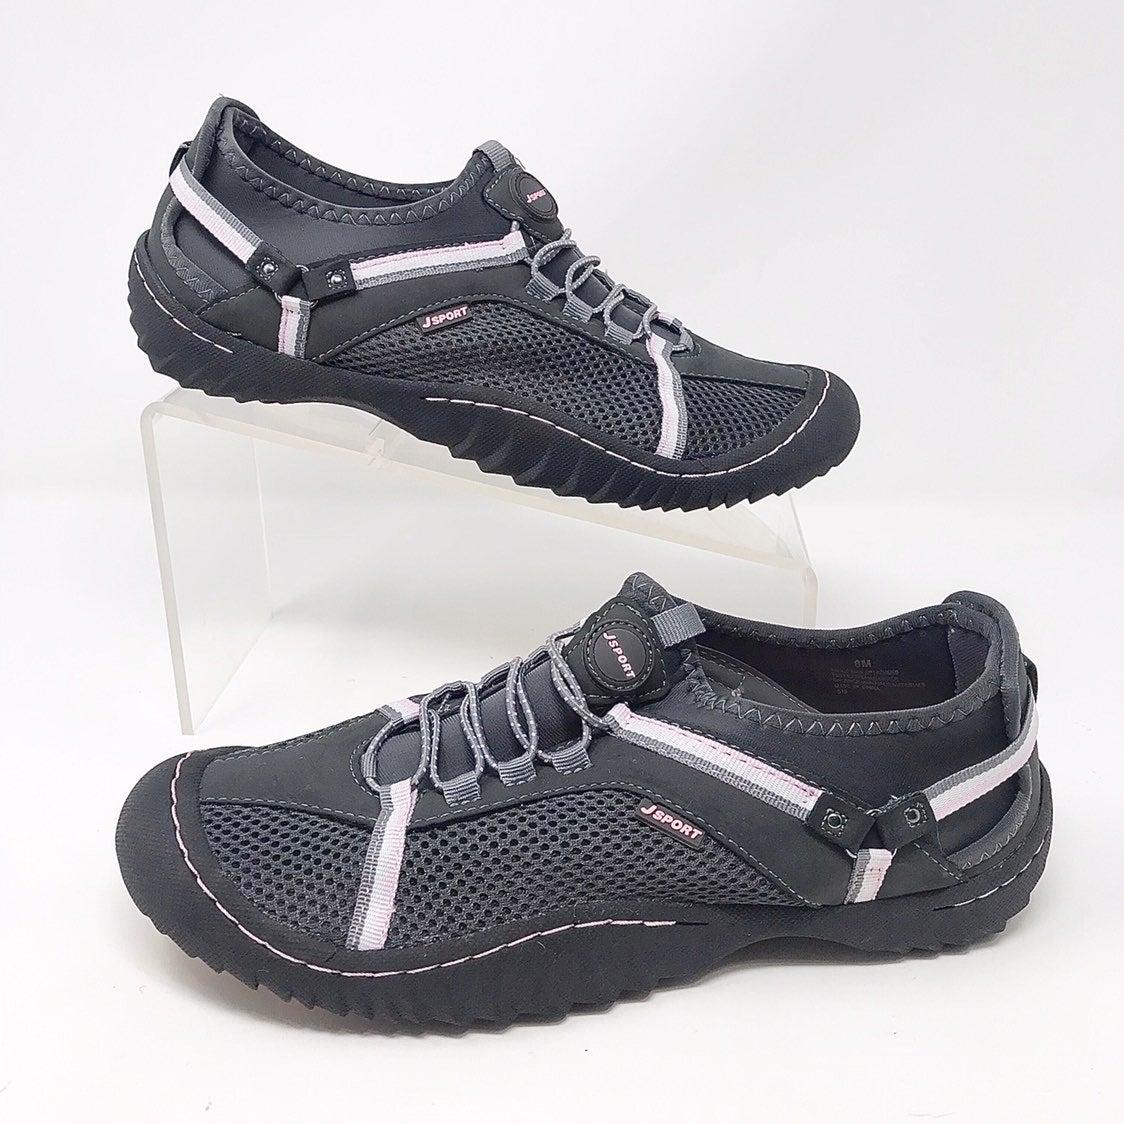 JSport By Jambu Shoes